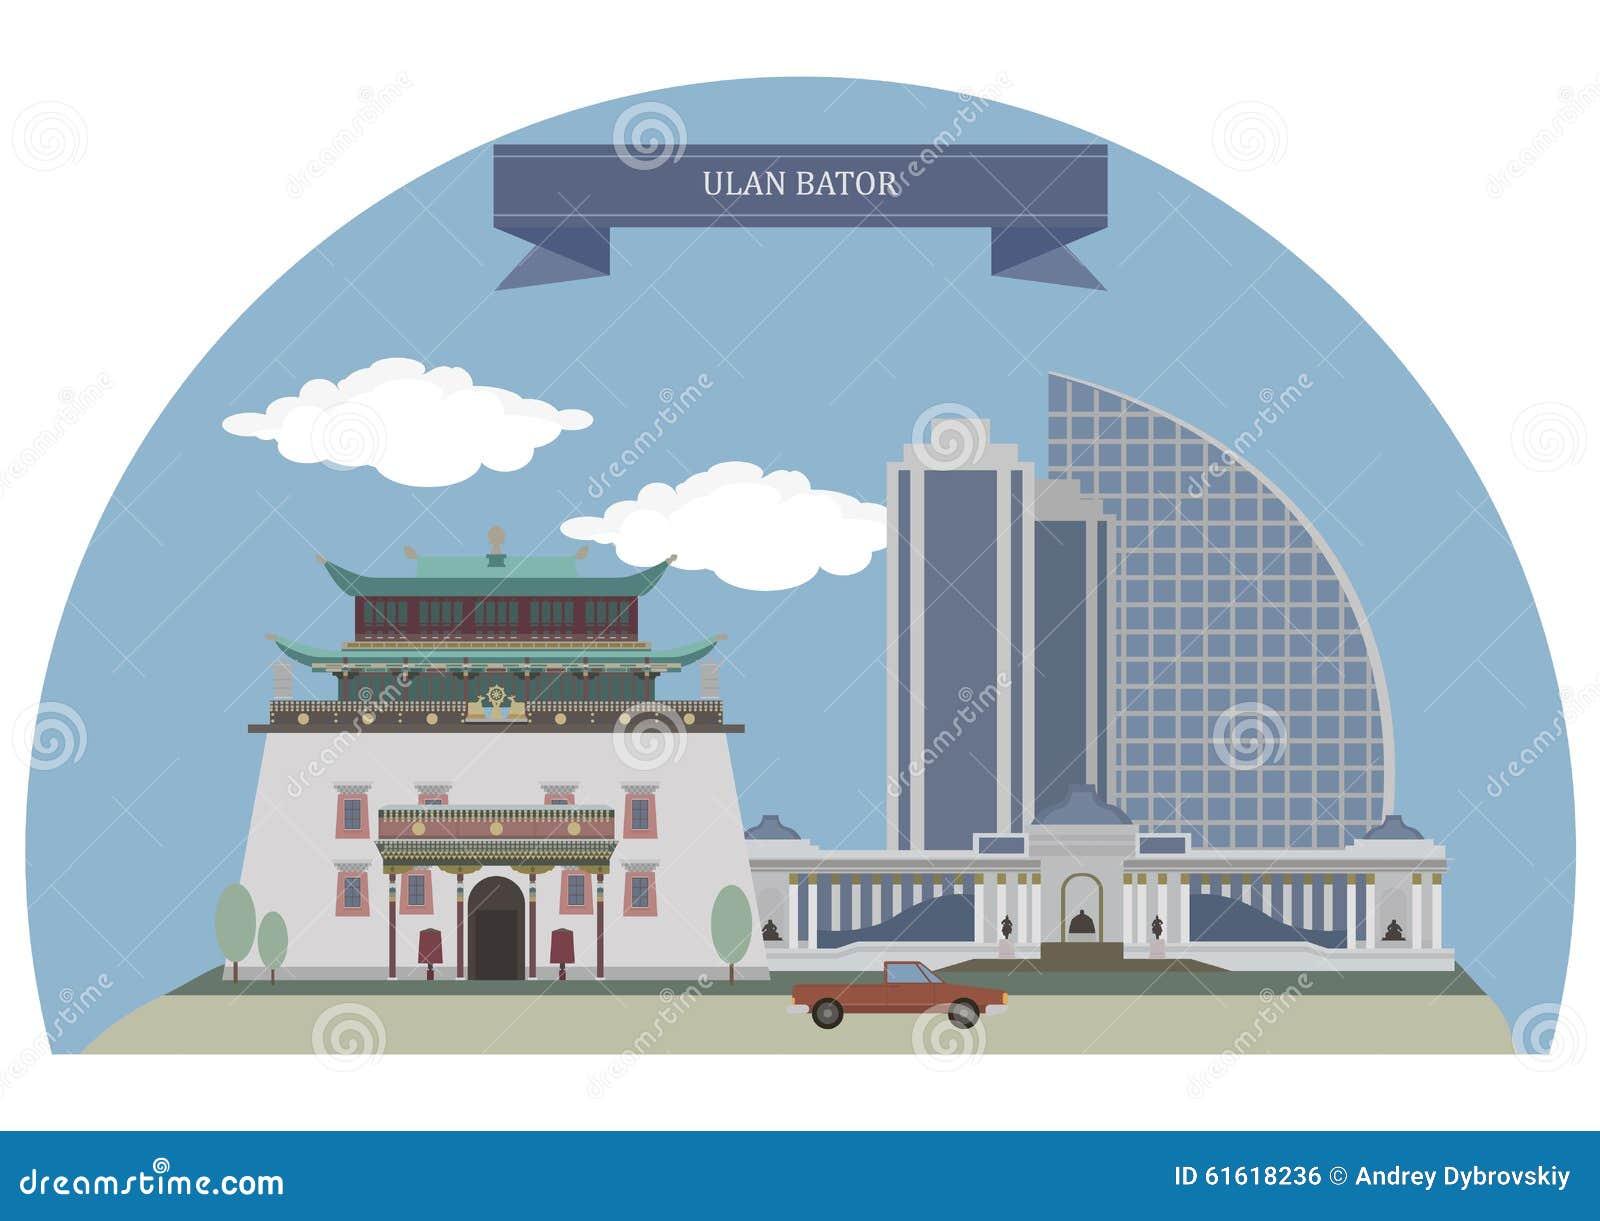 Ulán Bator, Mongolia